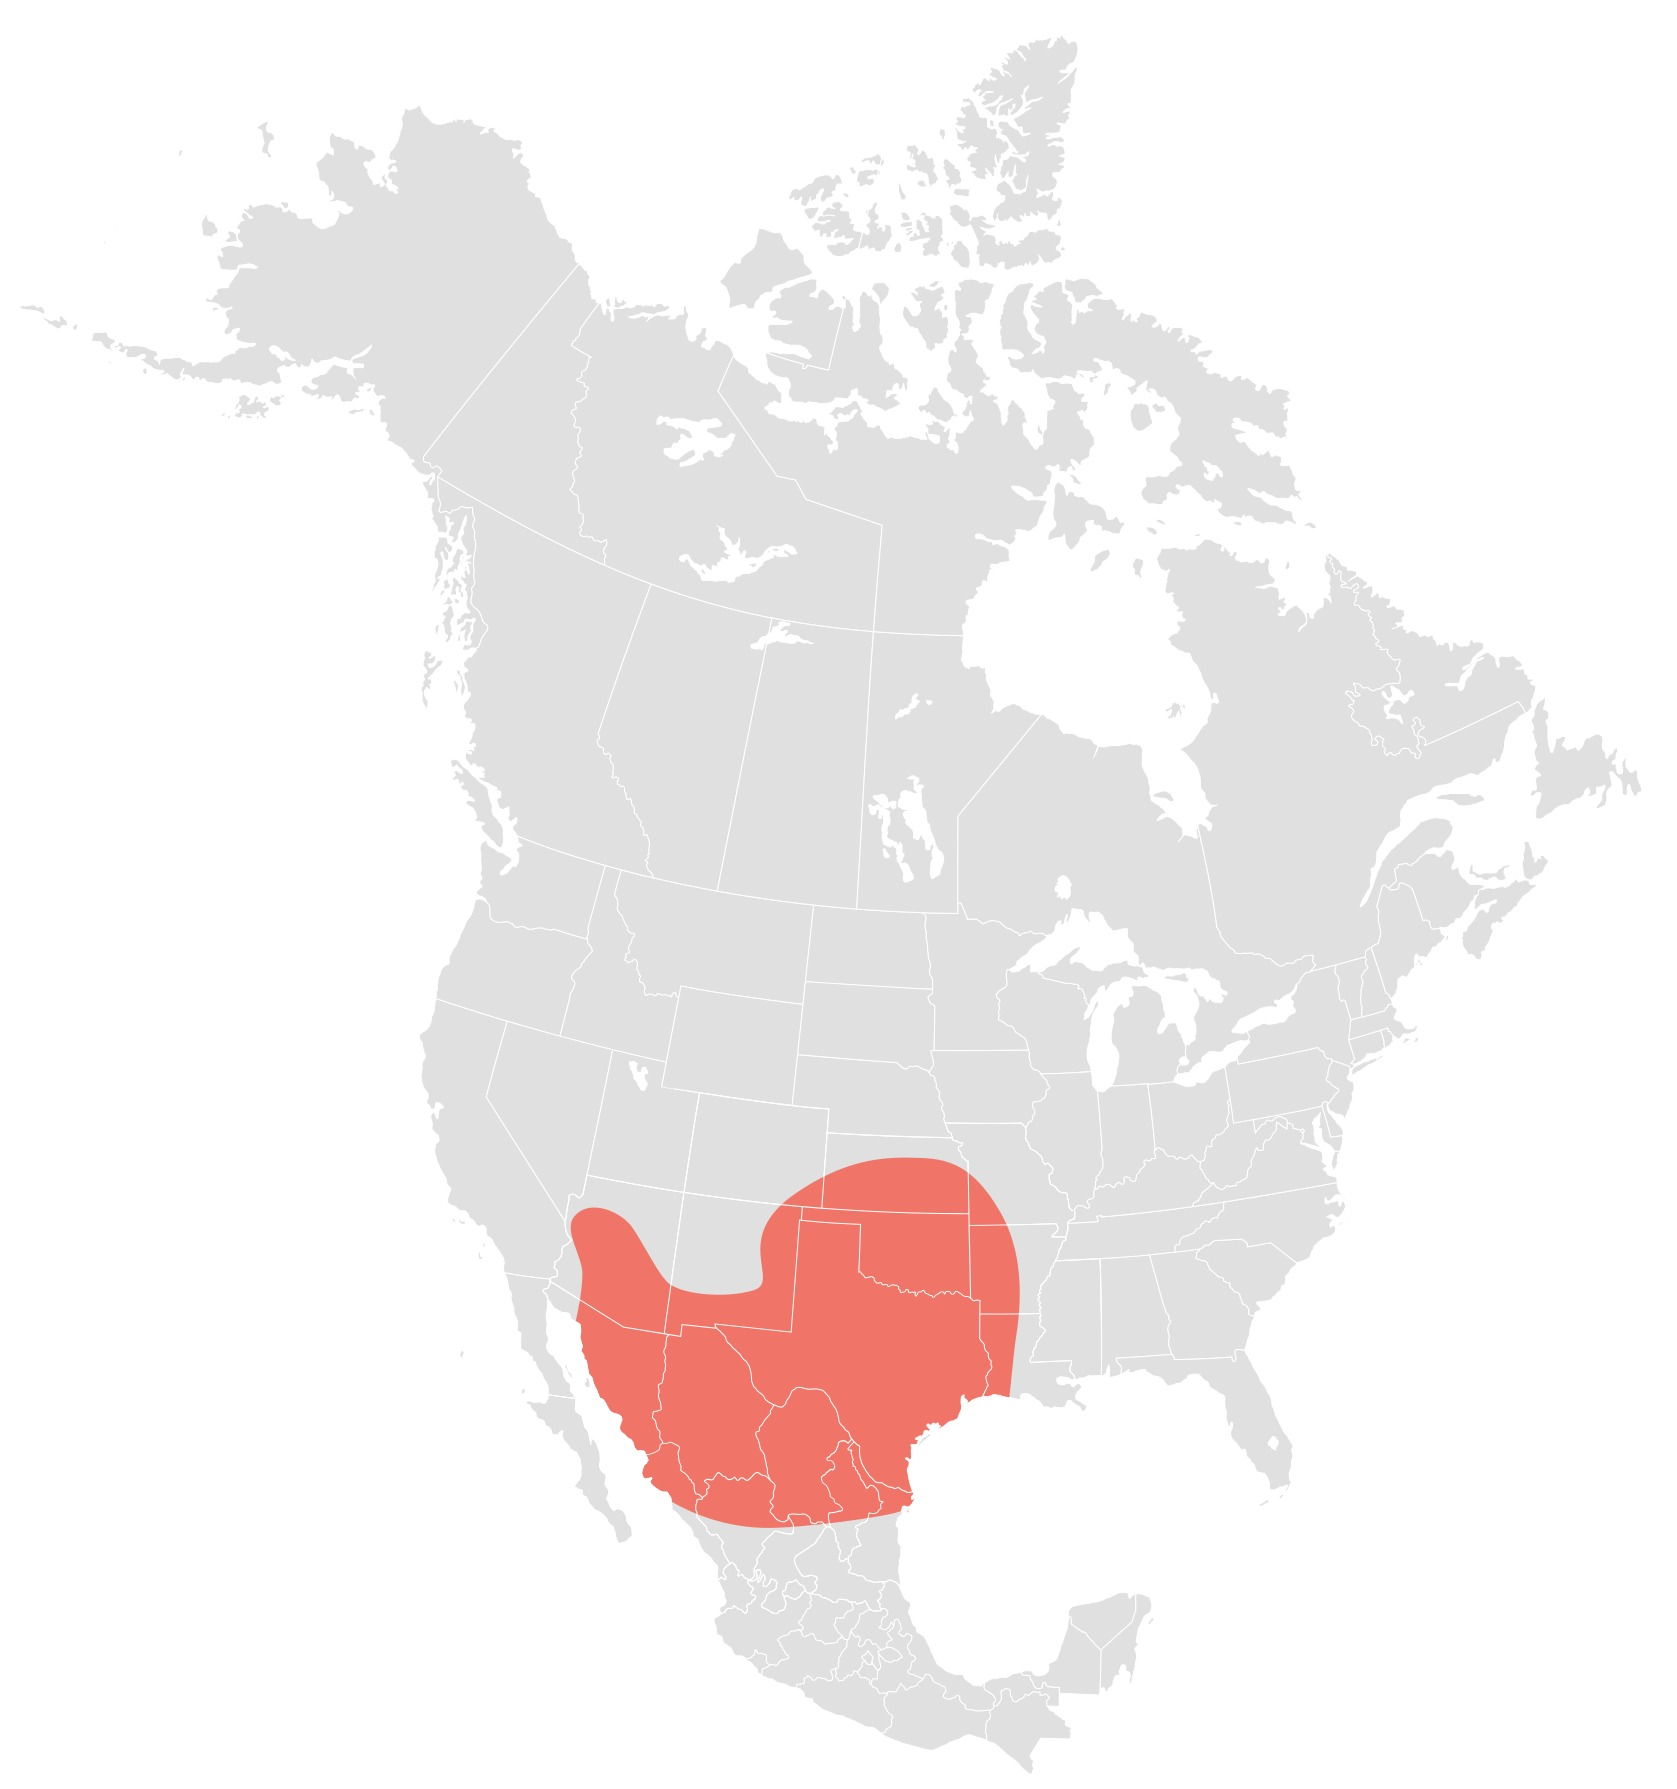 "<span class=""translation_missing"" title=""translation missing: en.medium.untitled.map_image_of, page_name: centipedes"">Map Image Of</span>"